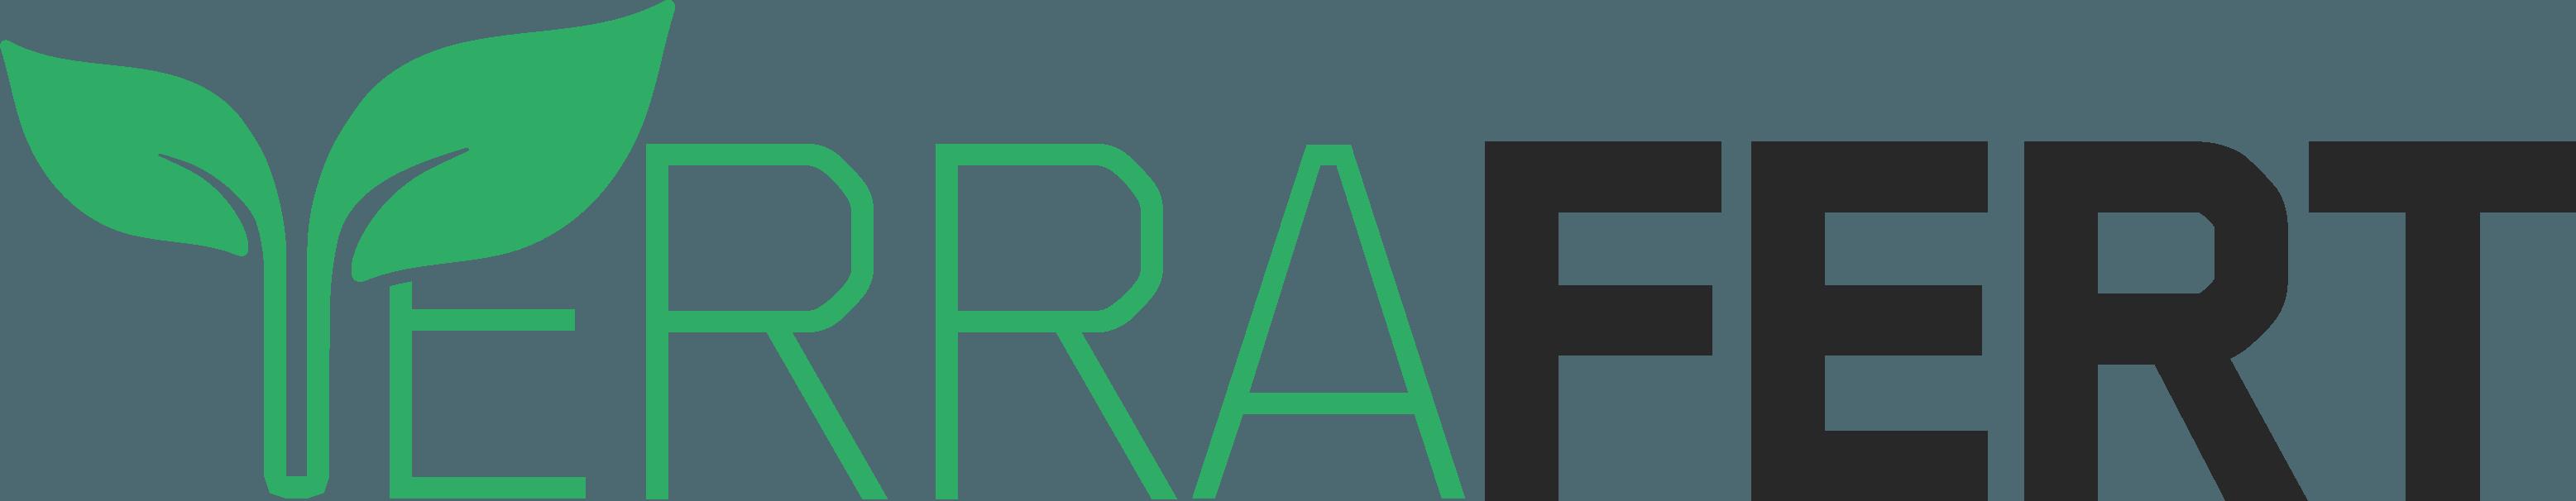 logotipo cofepasa terrafert